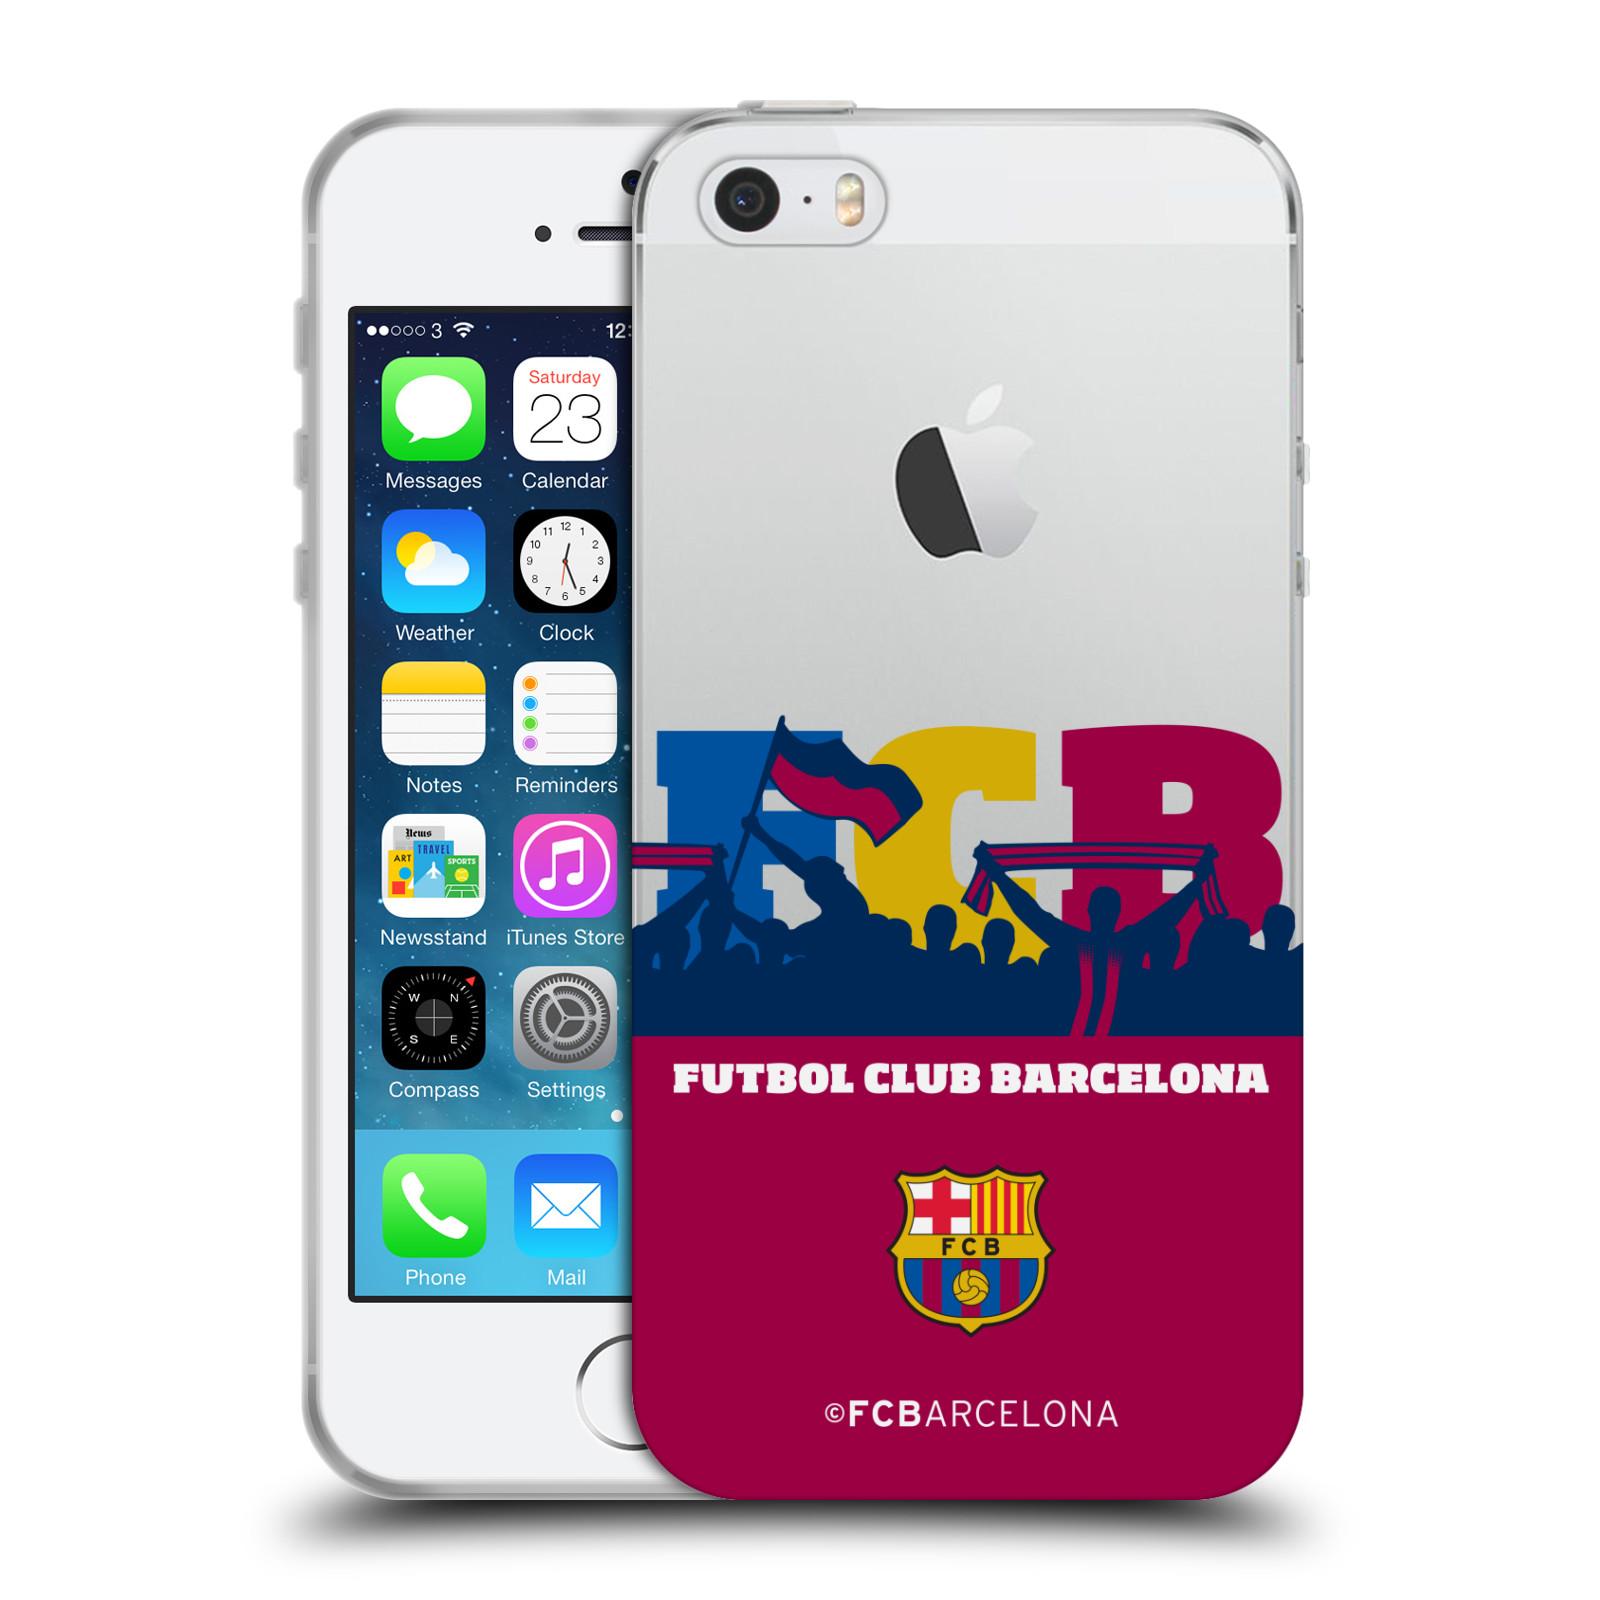 HEAD CASE silikonový obal na mobil Apple Iphone 5 5S Fotbalový klub FC  BARCELONA silueta barevná fanoušci průhledný 0a8854f3910